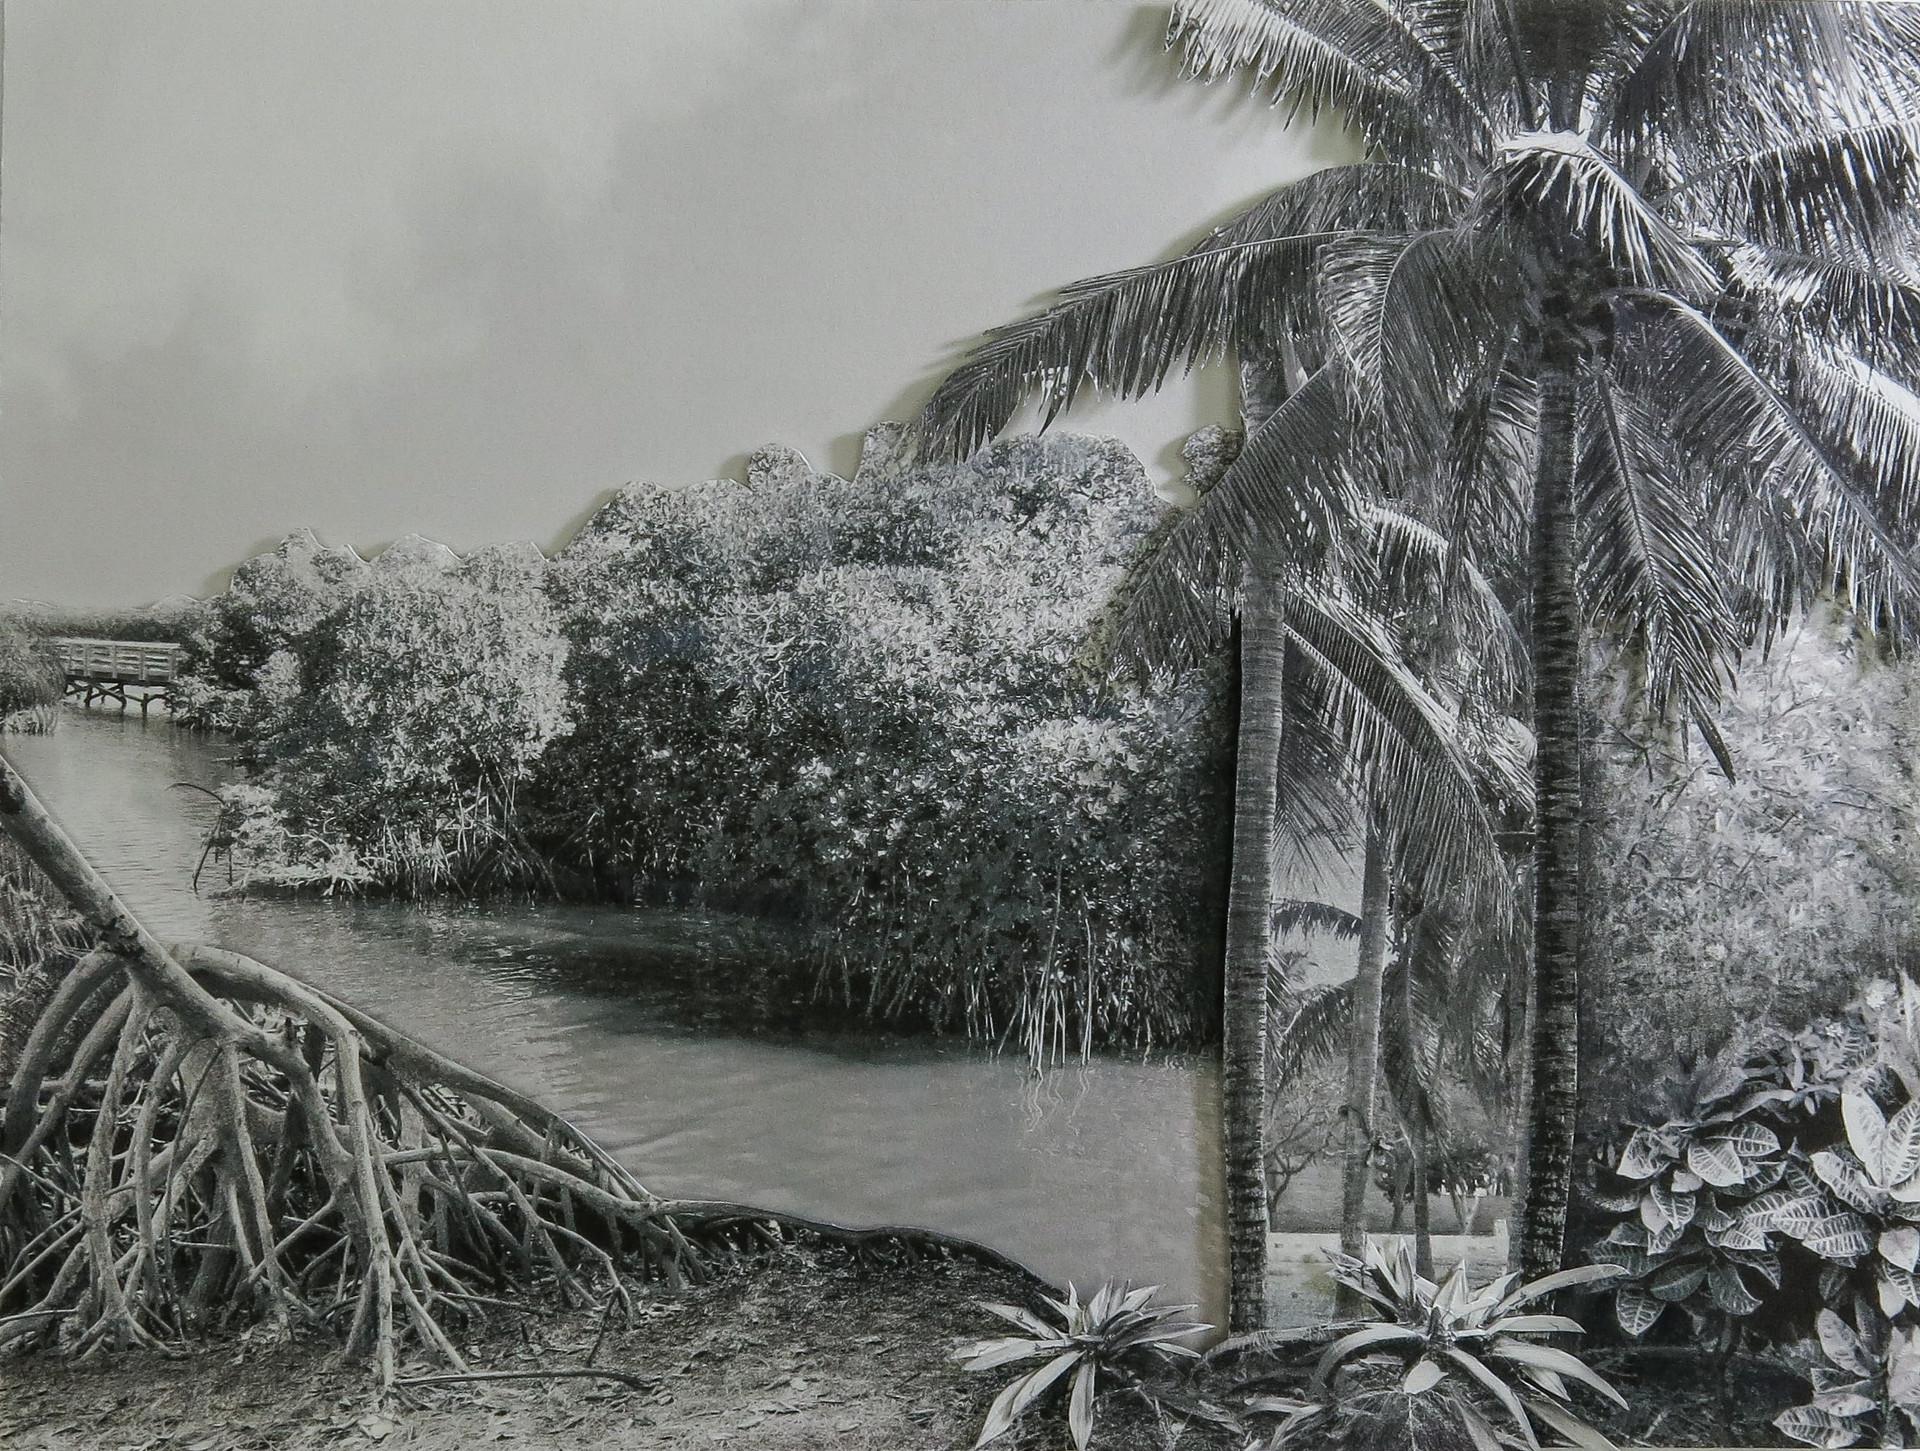 Landscape, Imagined #4